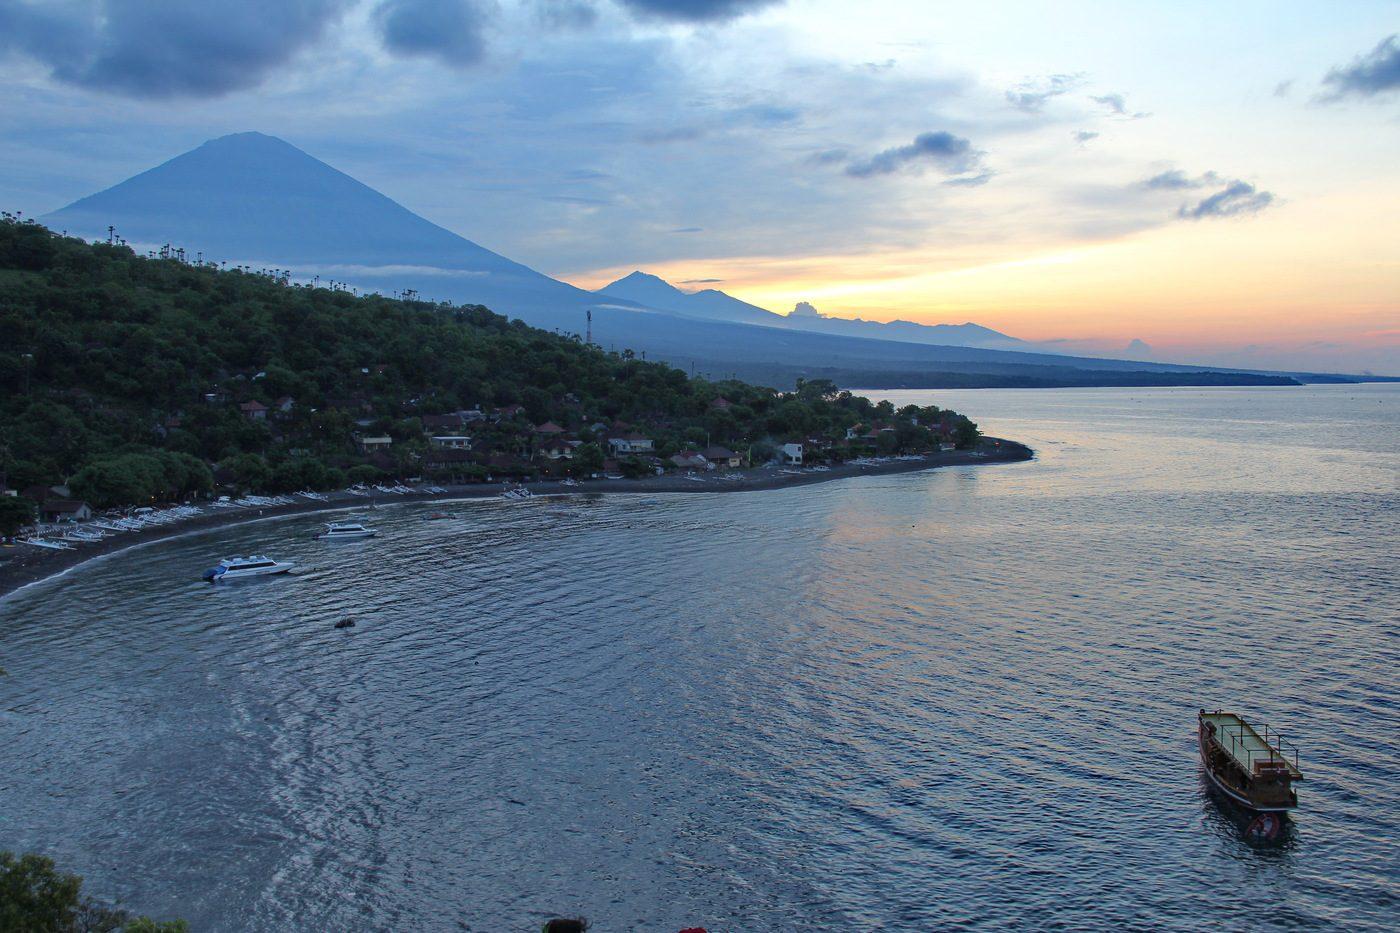 Так выглядит Амед на Бали